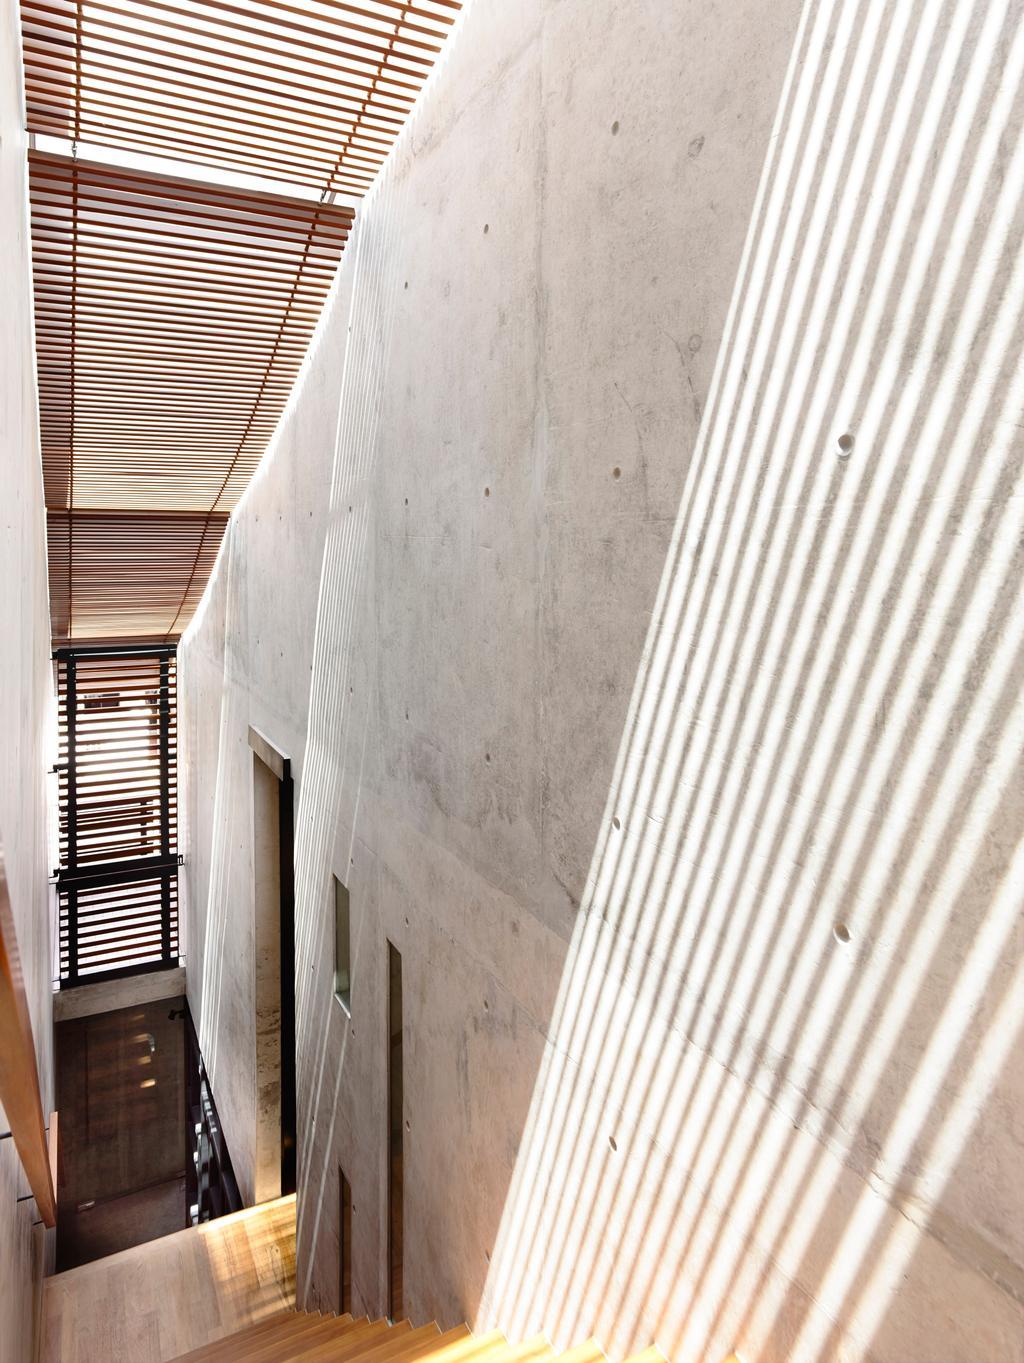 Contemporary, Landed, Belimbing Avenue, Architect, HYLA Architects, Boardwalk, Bridge, Building